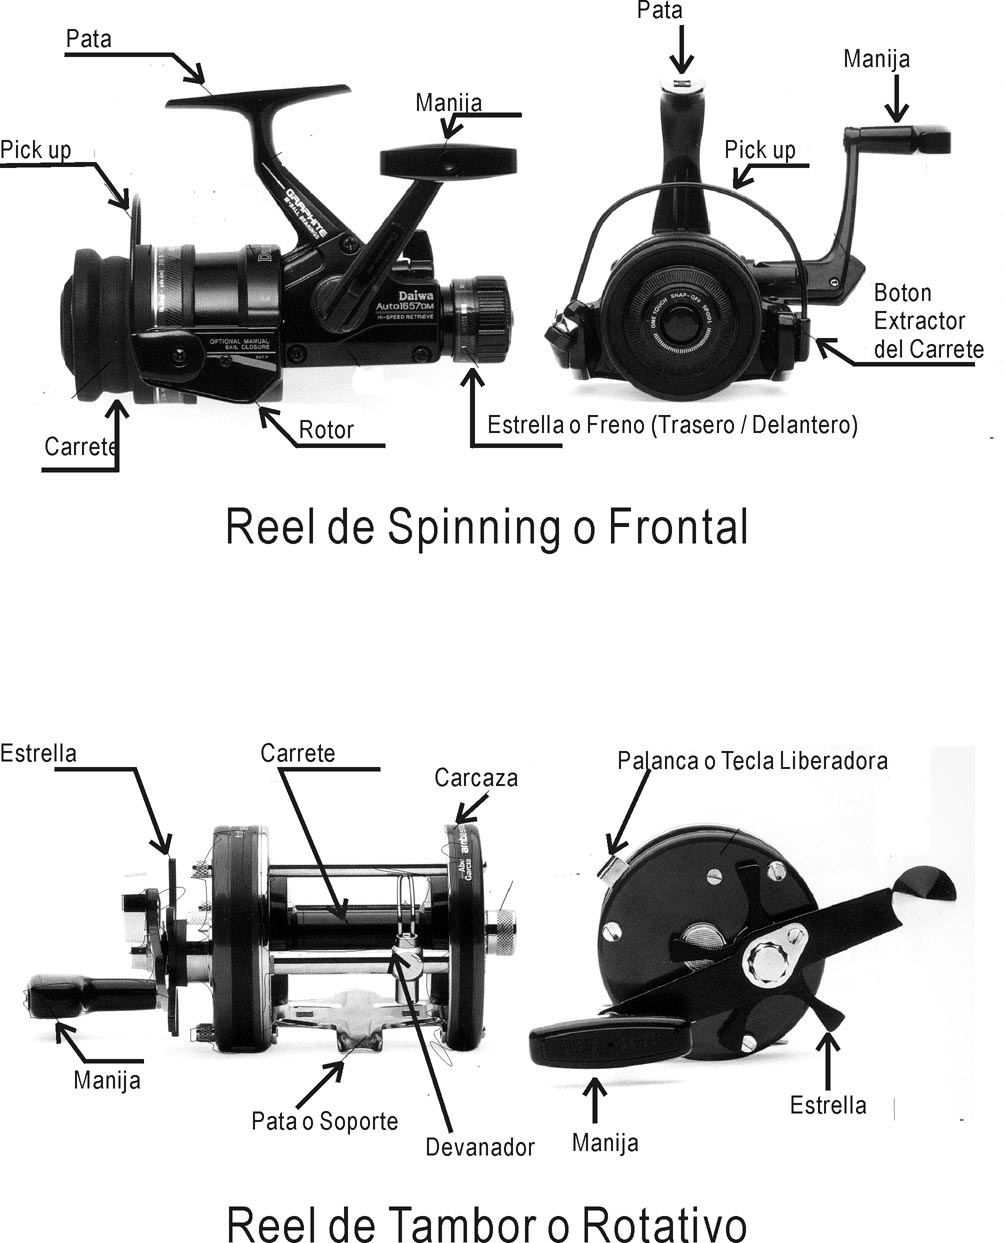 Venza For Sale >> Reels recomendados para cada ámbito/técnica de pesca   PESCADOR DEPORTIVO